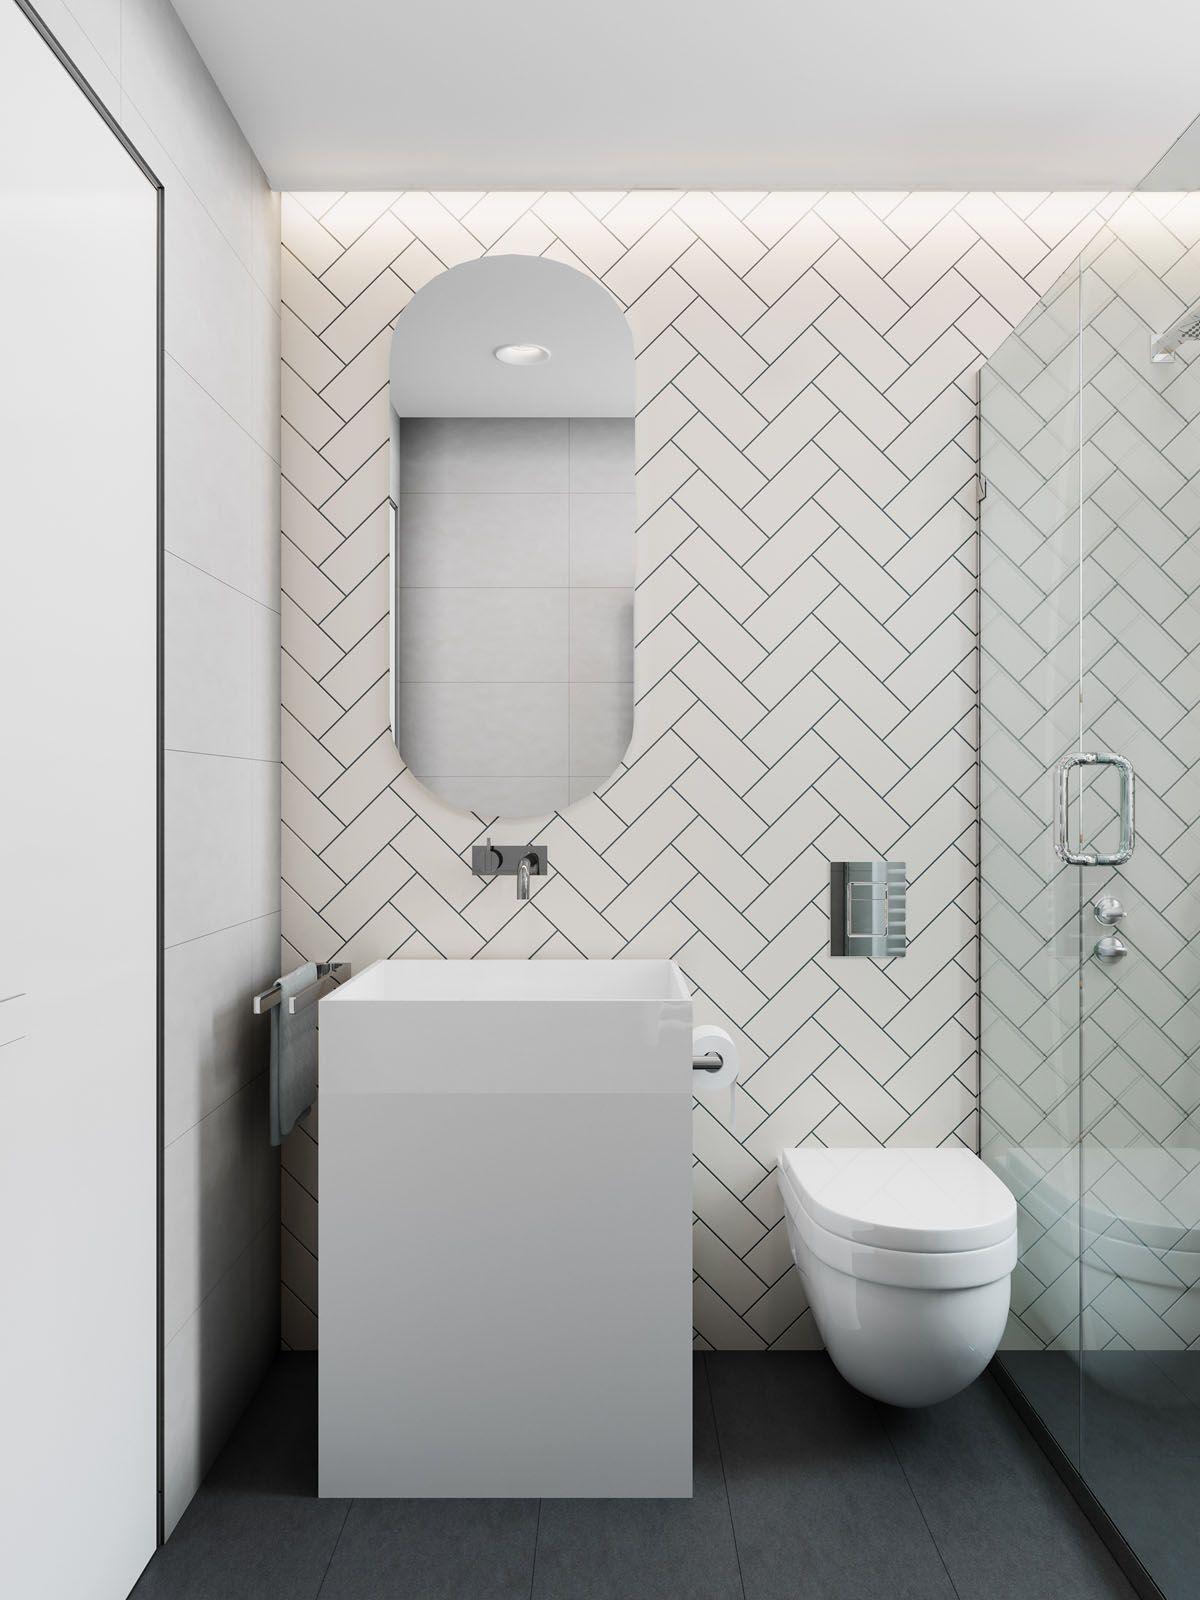 2 Simple Modern Homes With Simple Modern Furnishings Bathroom Design Small Modern Latest Bathroom Tiles Design Interior Design Bathroom Small